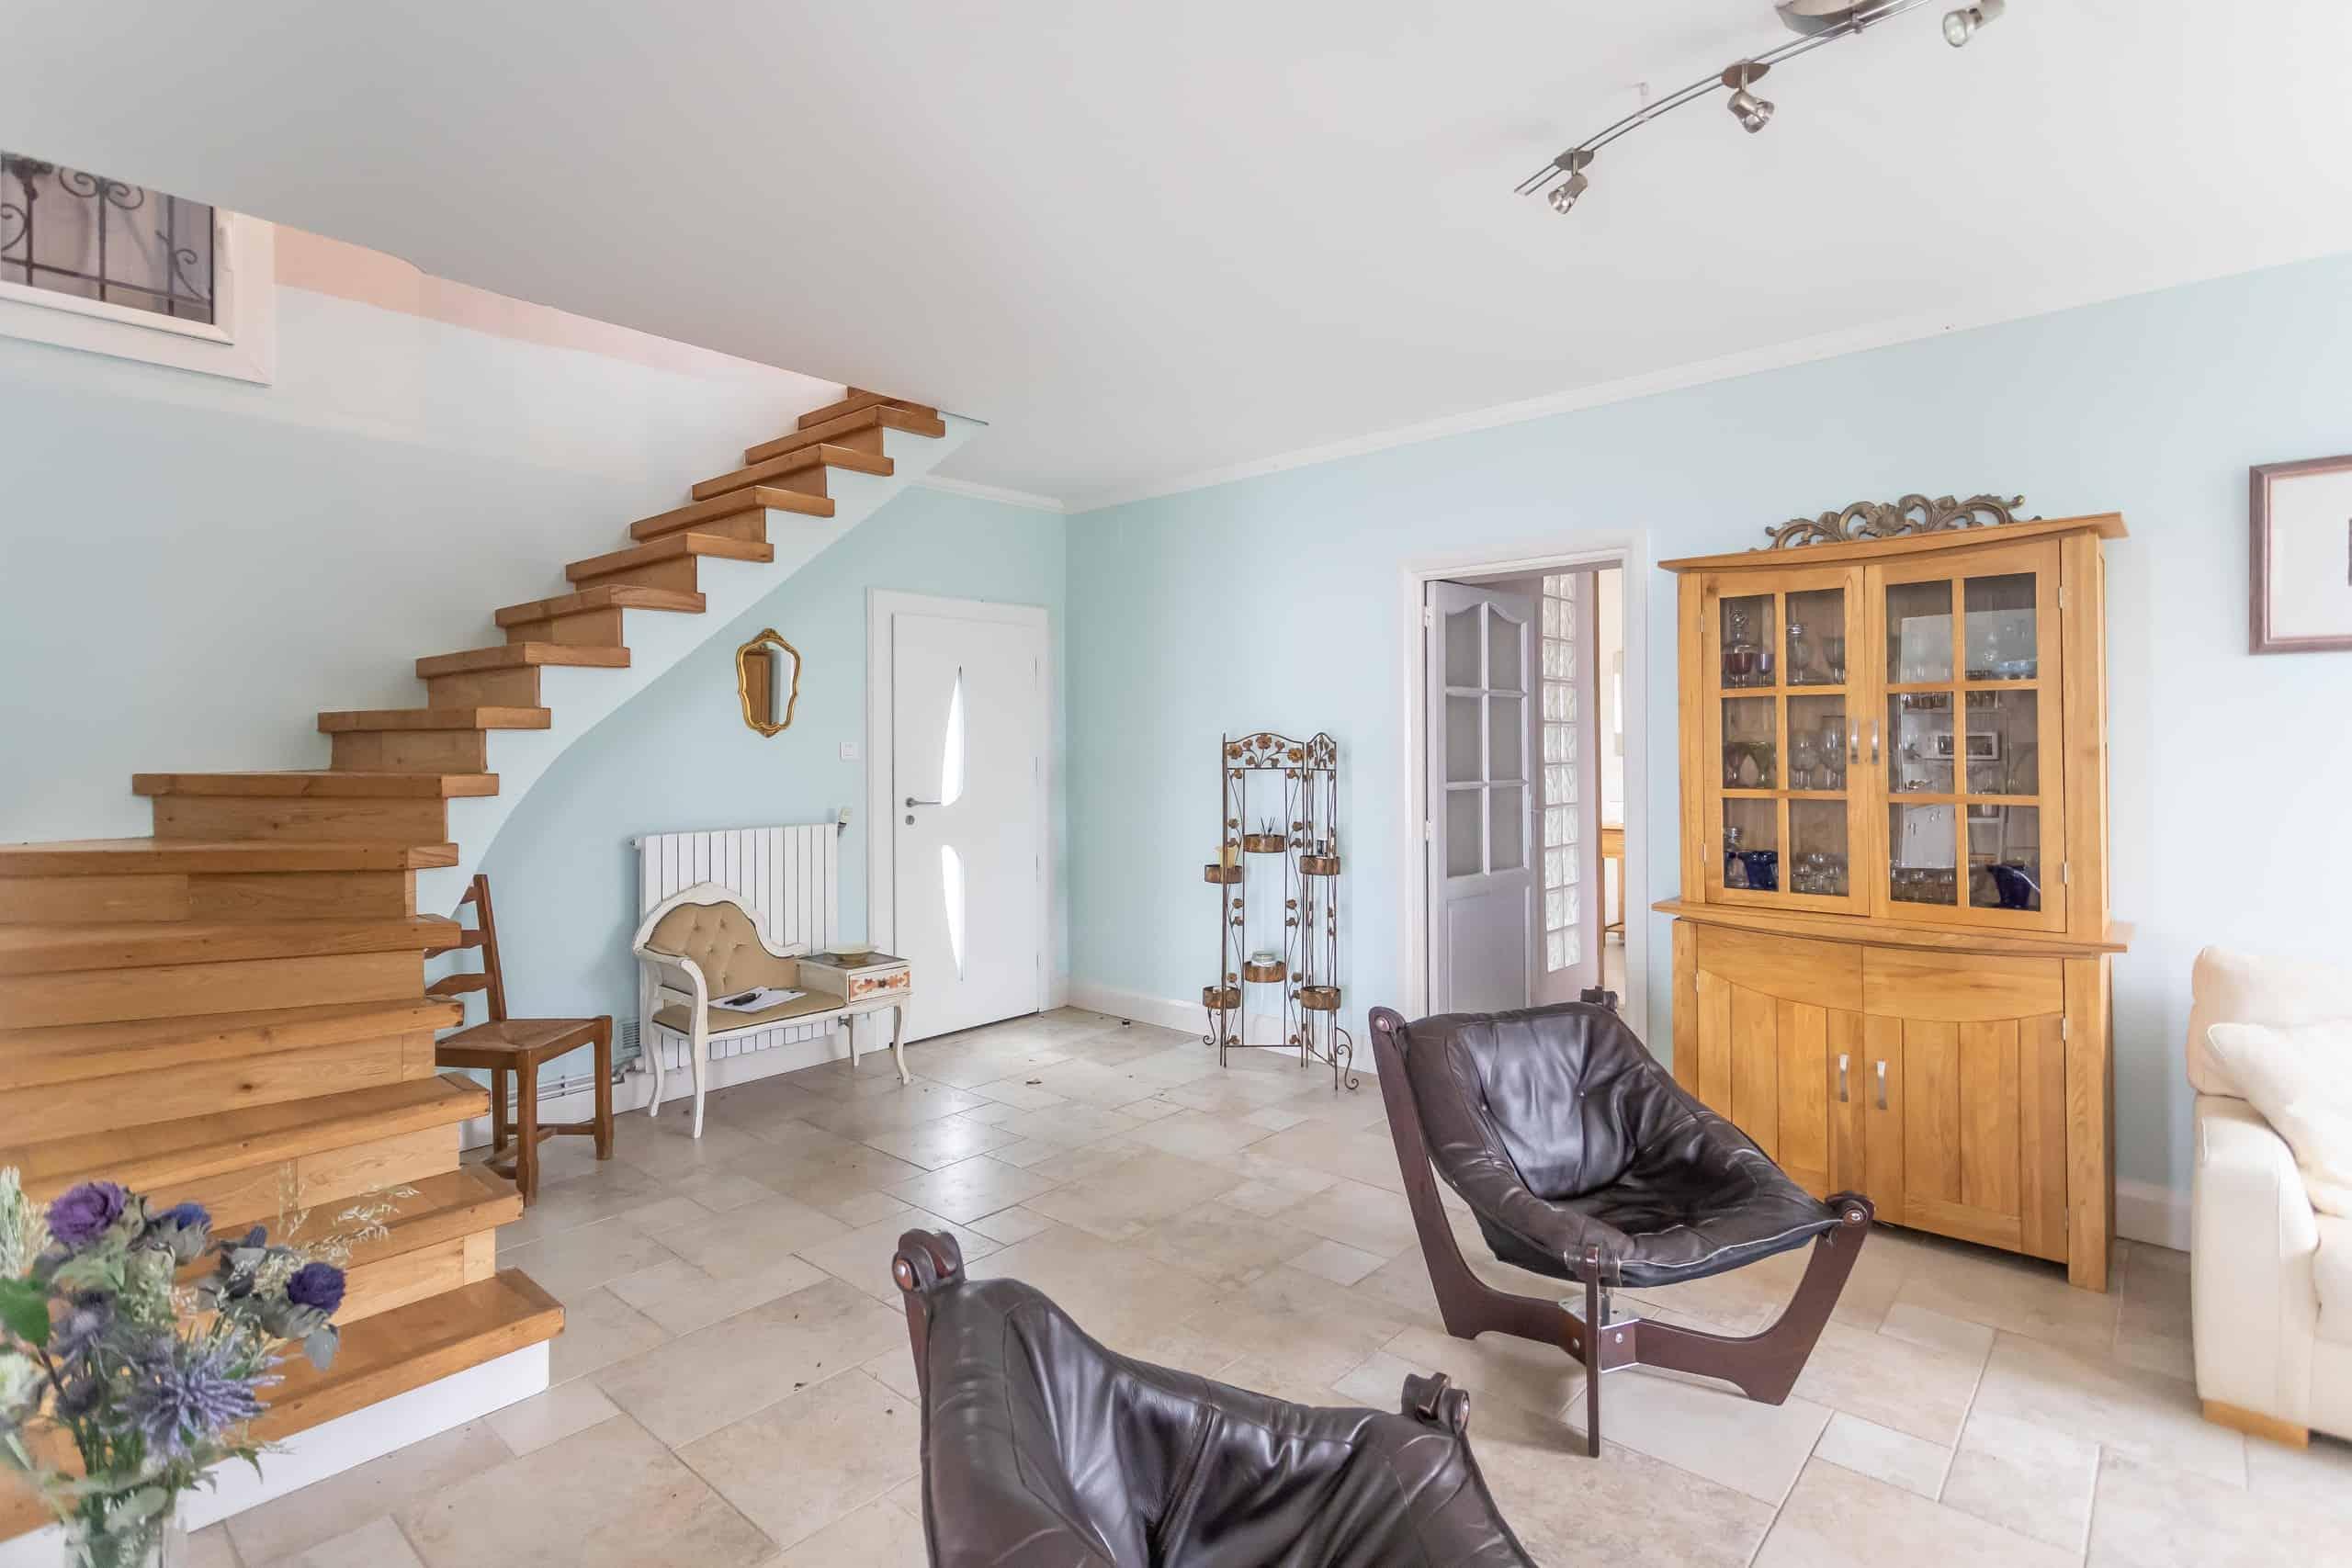 Staircase-WMC053